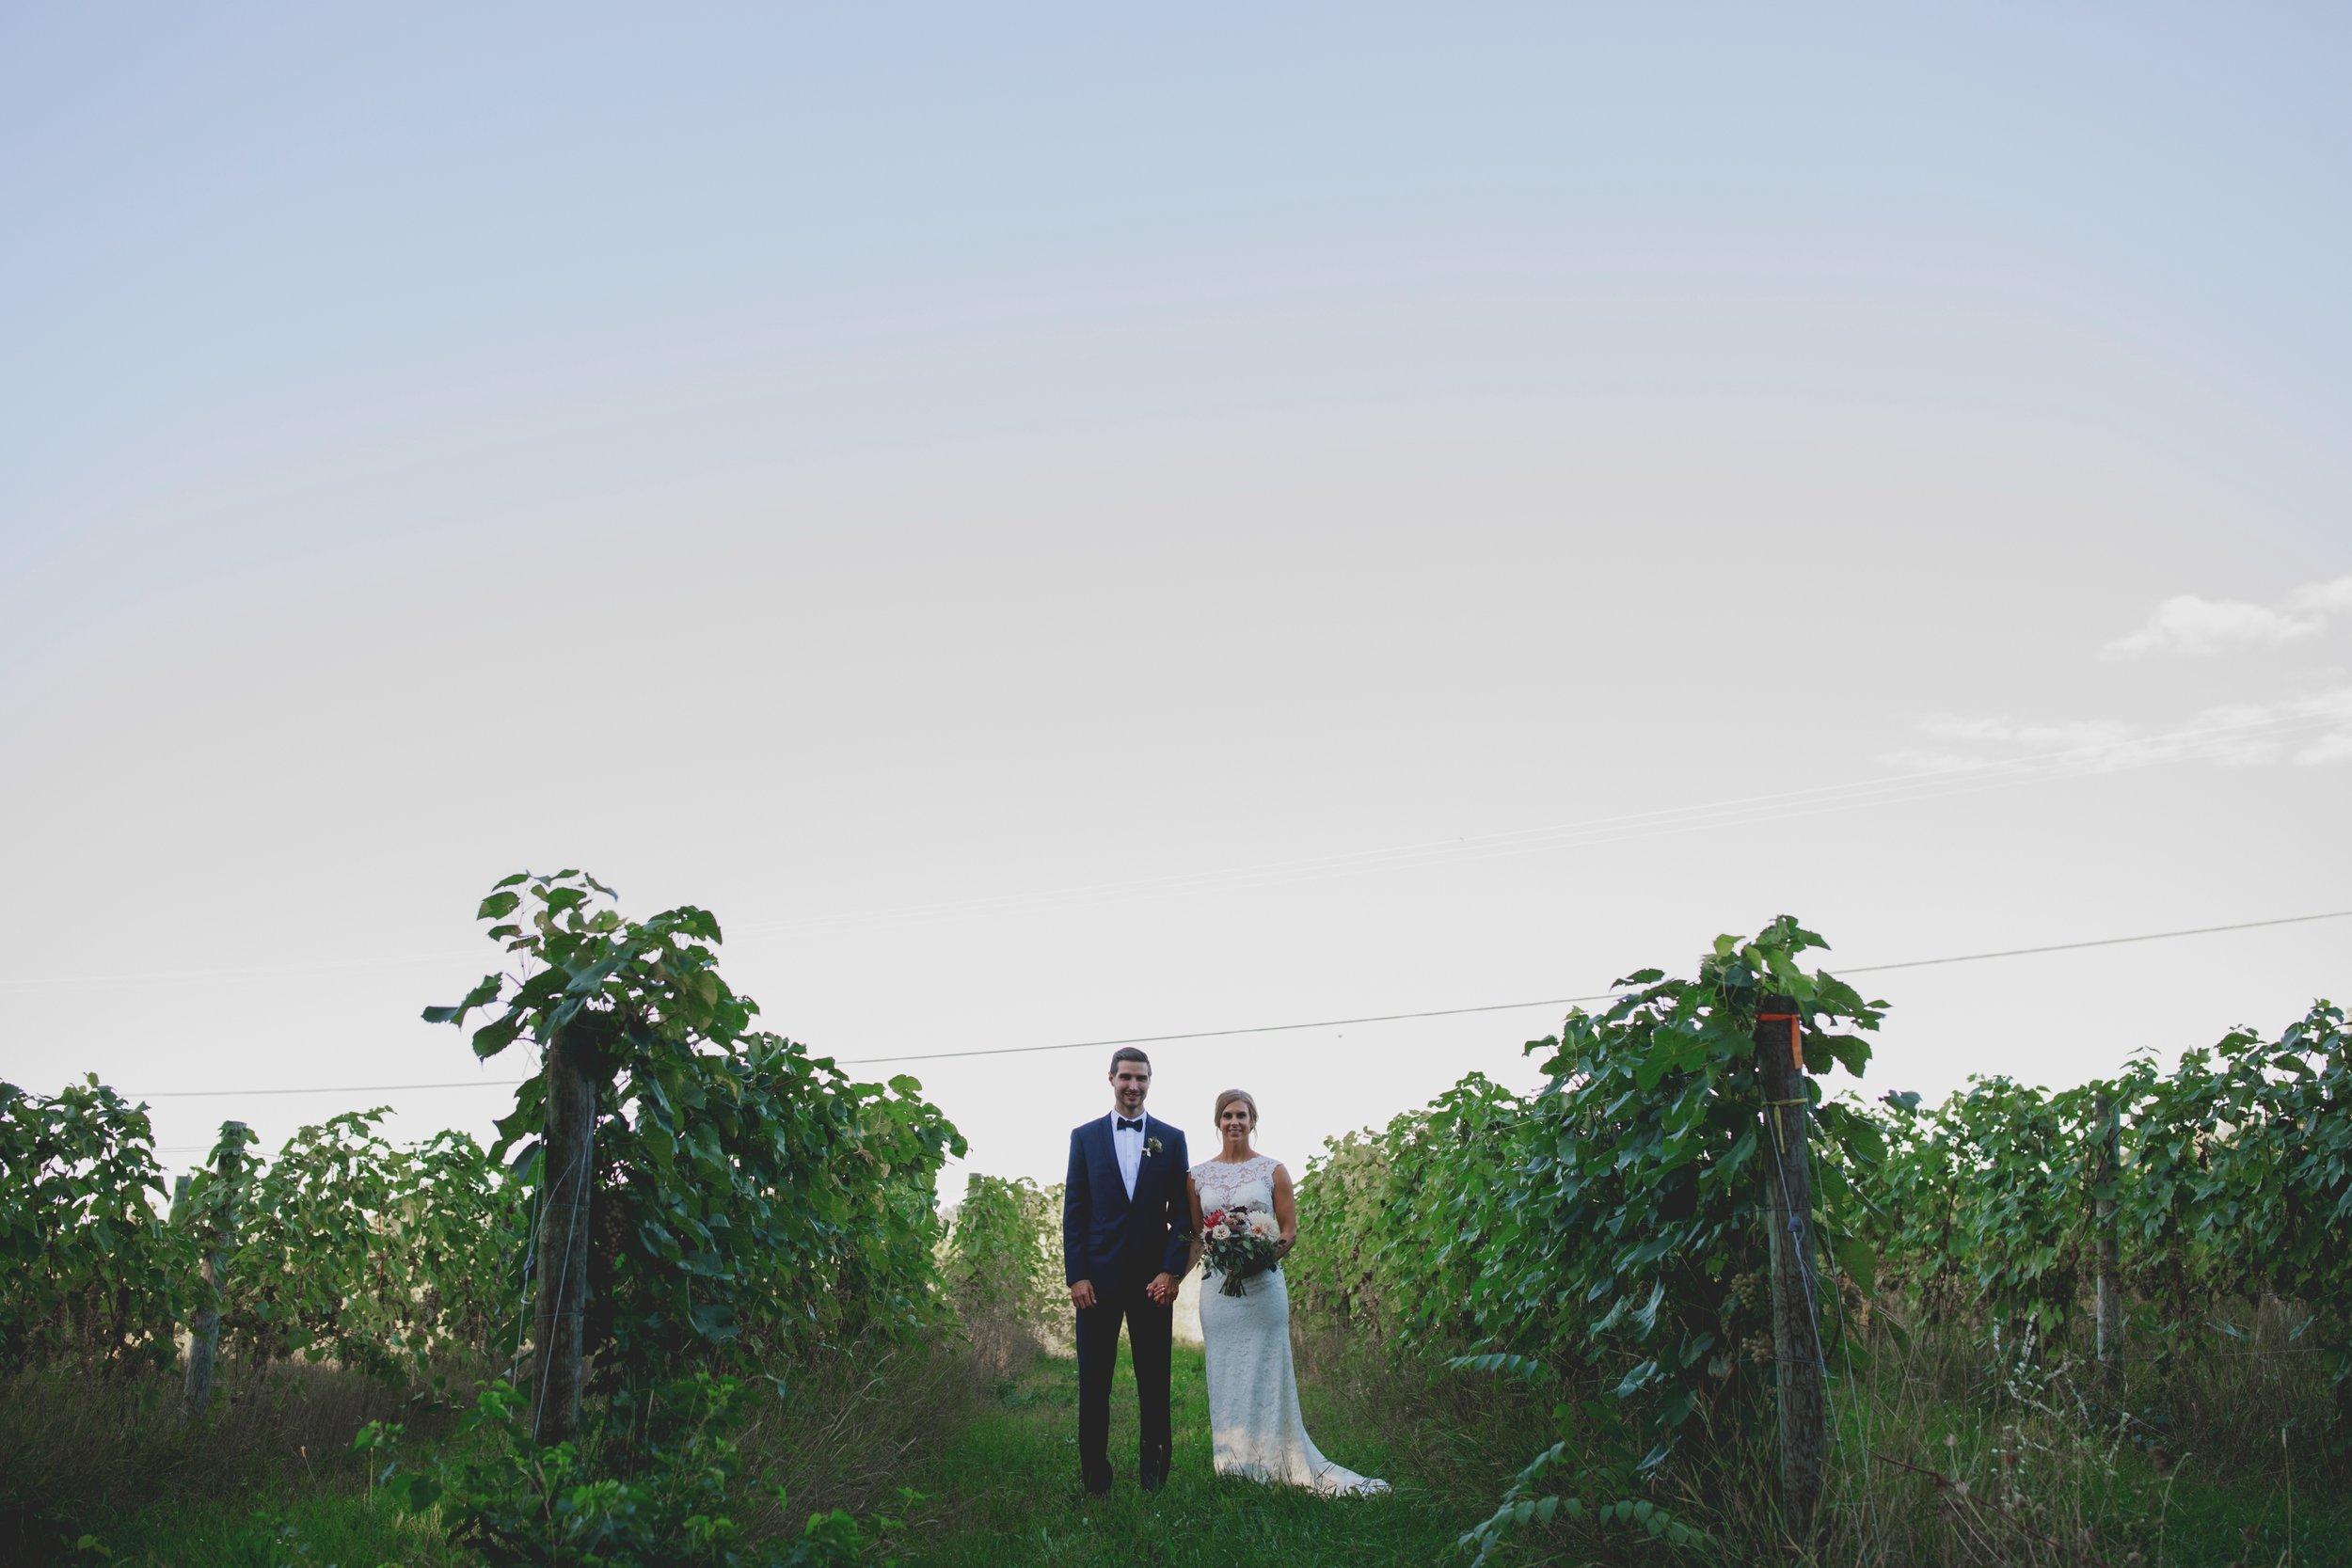 traverse_city_wedding_083.jpg